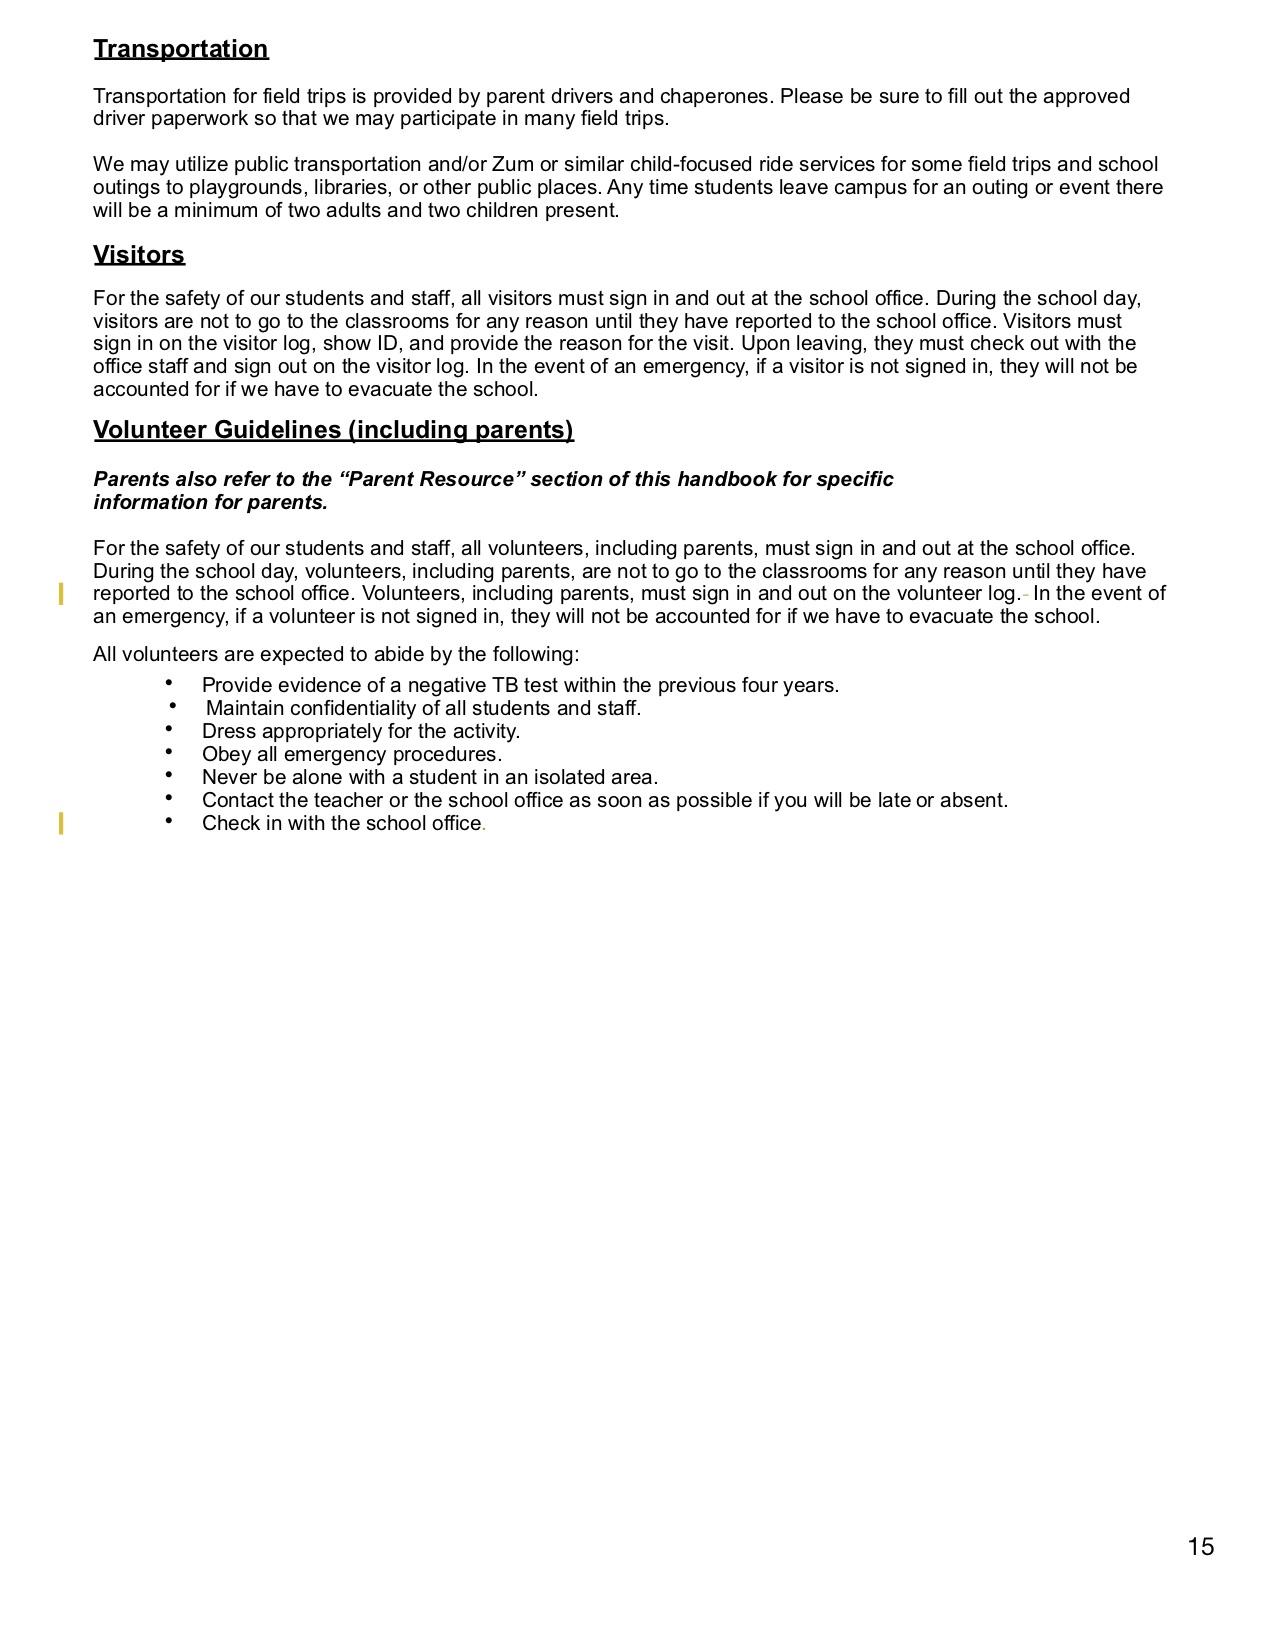 18-19 Parent and Student Handbook V4-14.jpg